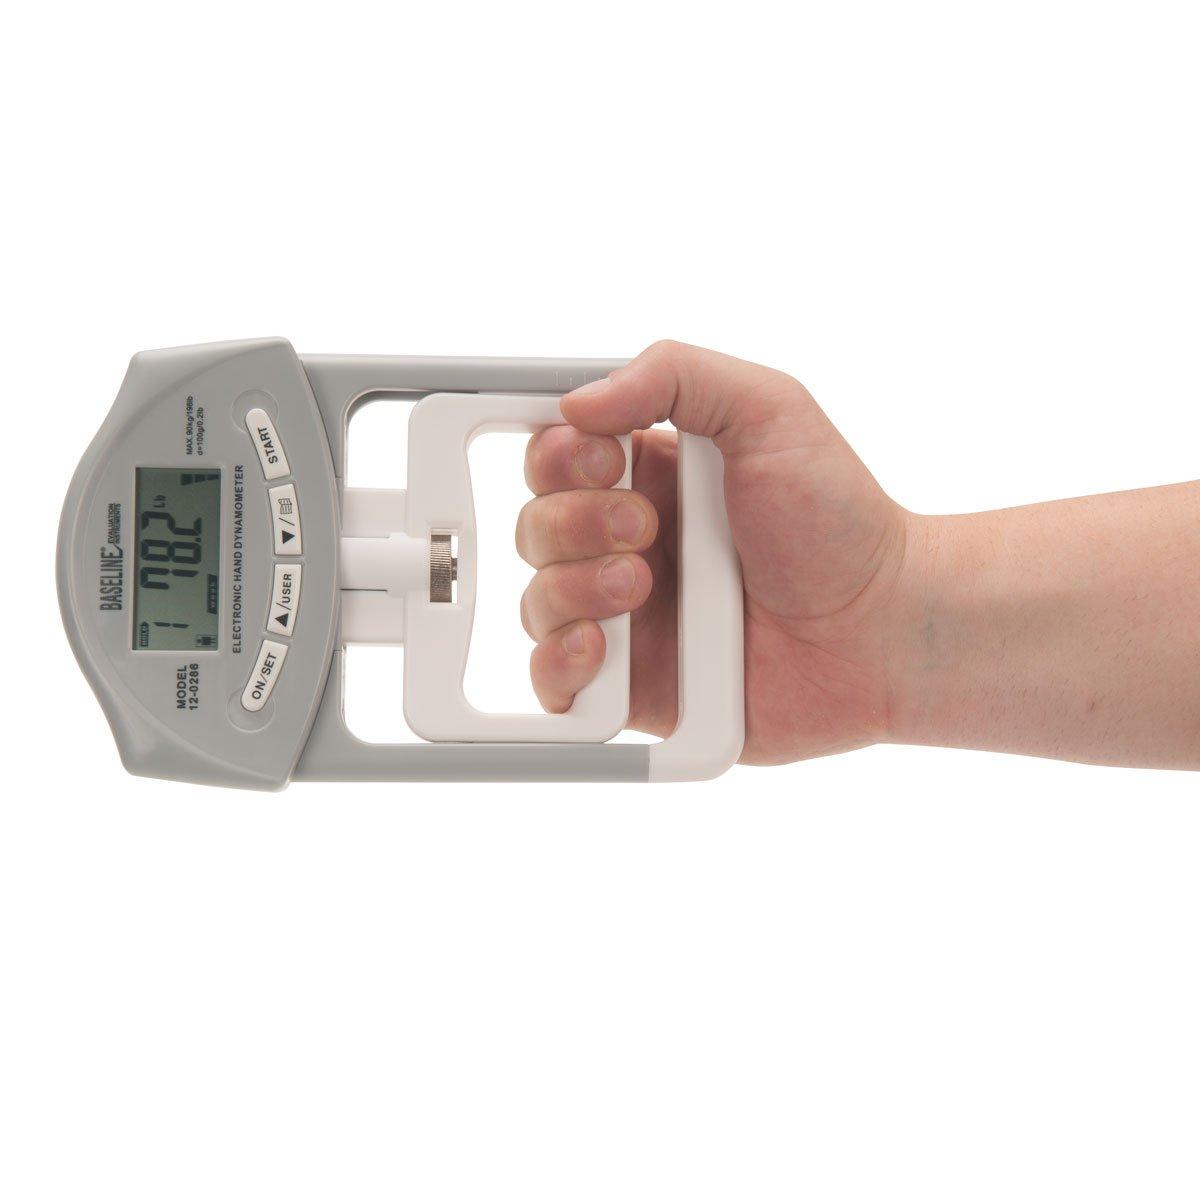 Fabrication Ent Baseline Smedley Digital Grip Tester by Baseline